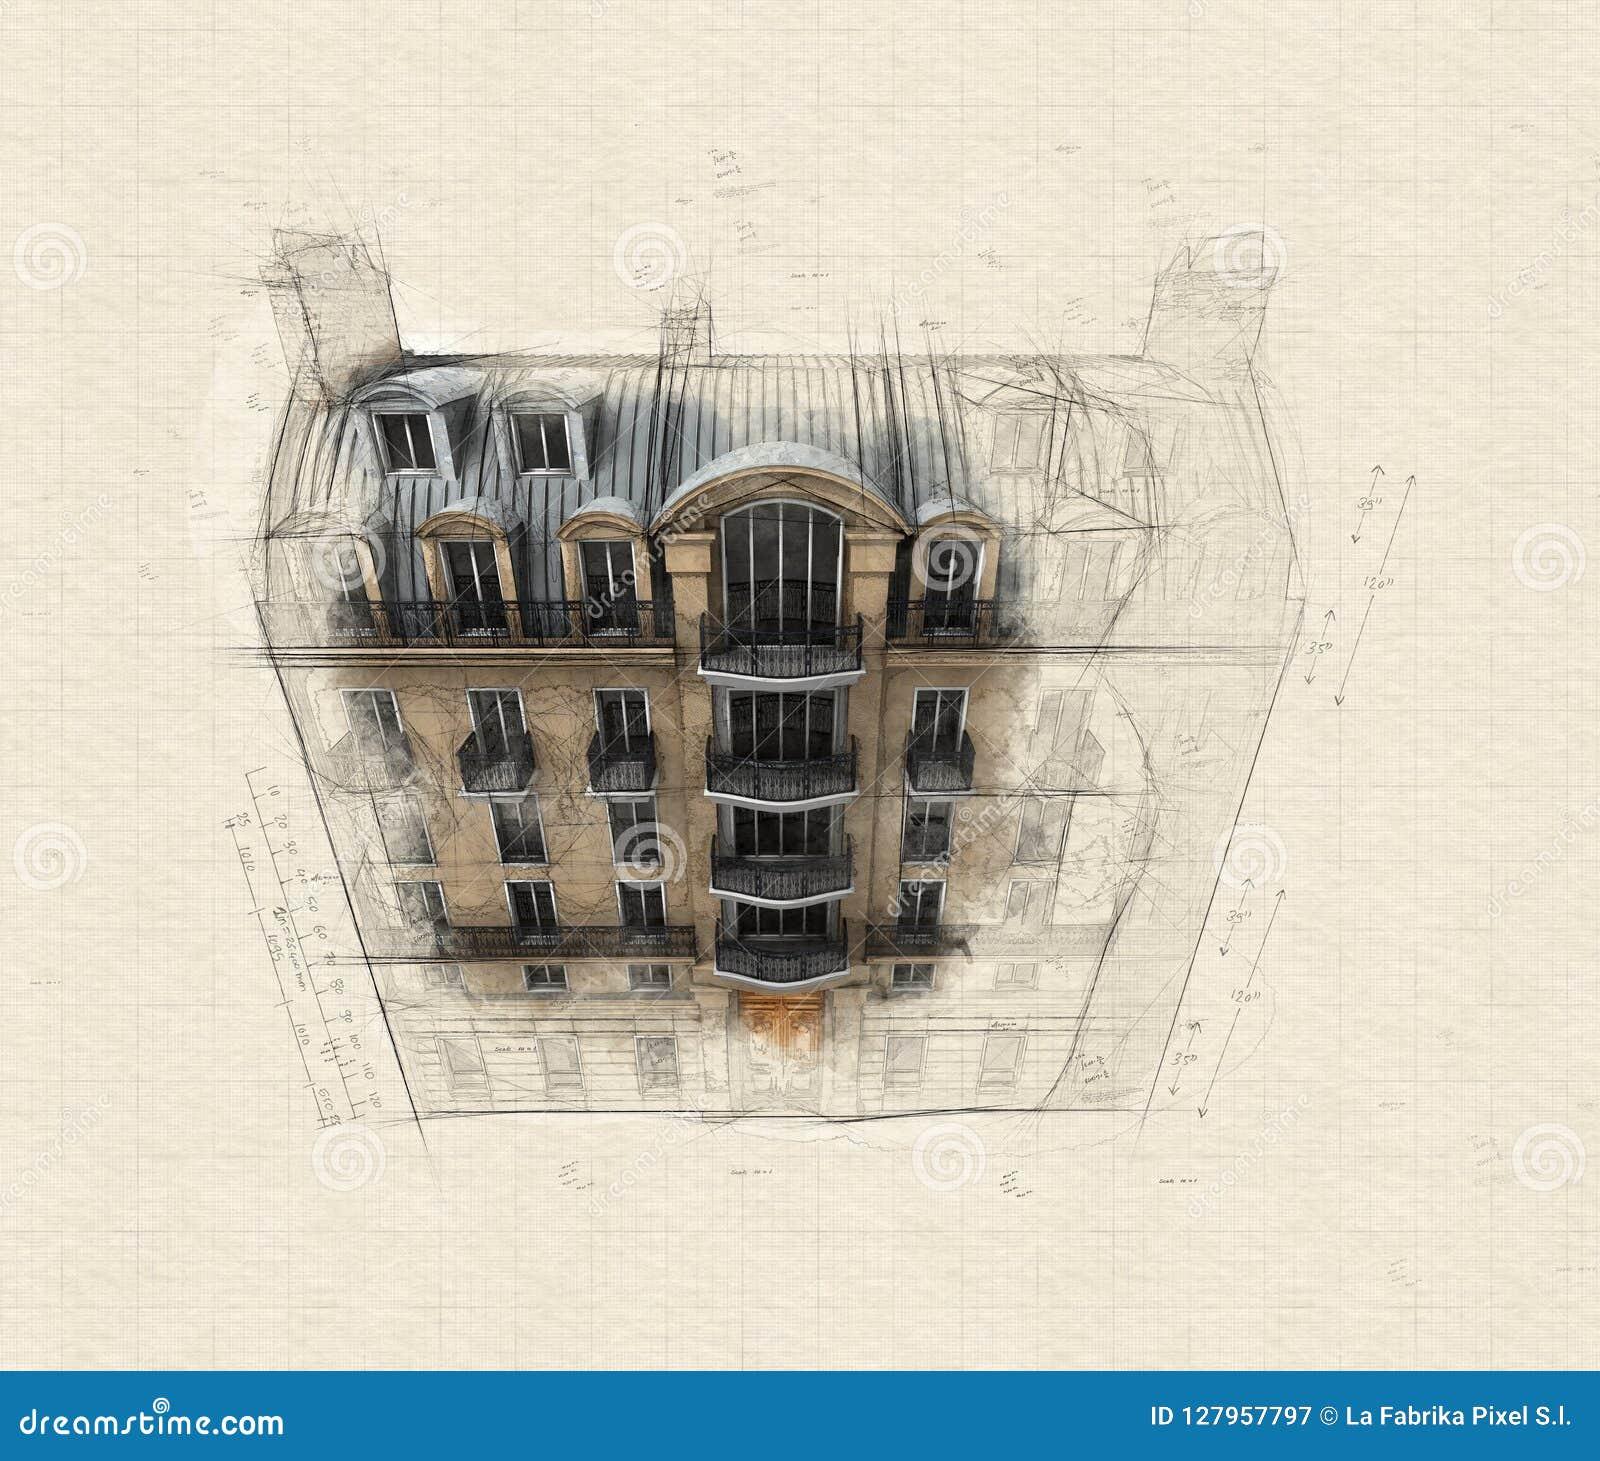 Aerial perspective of Parisian building